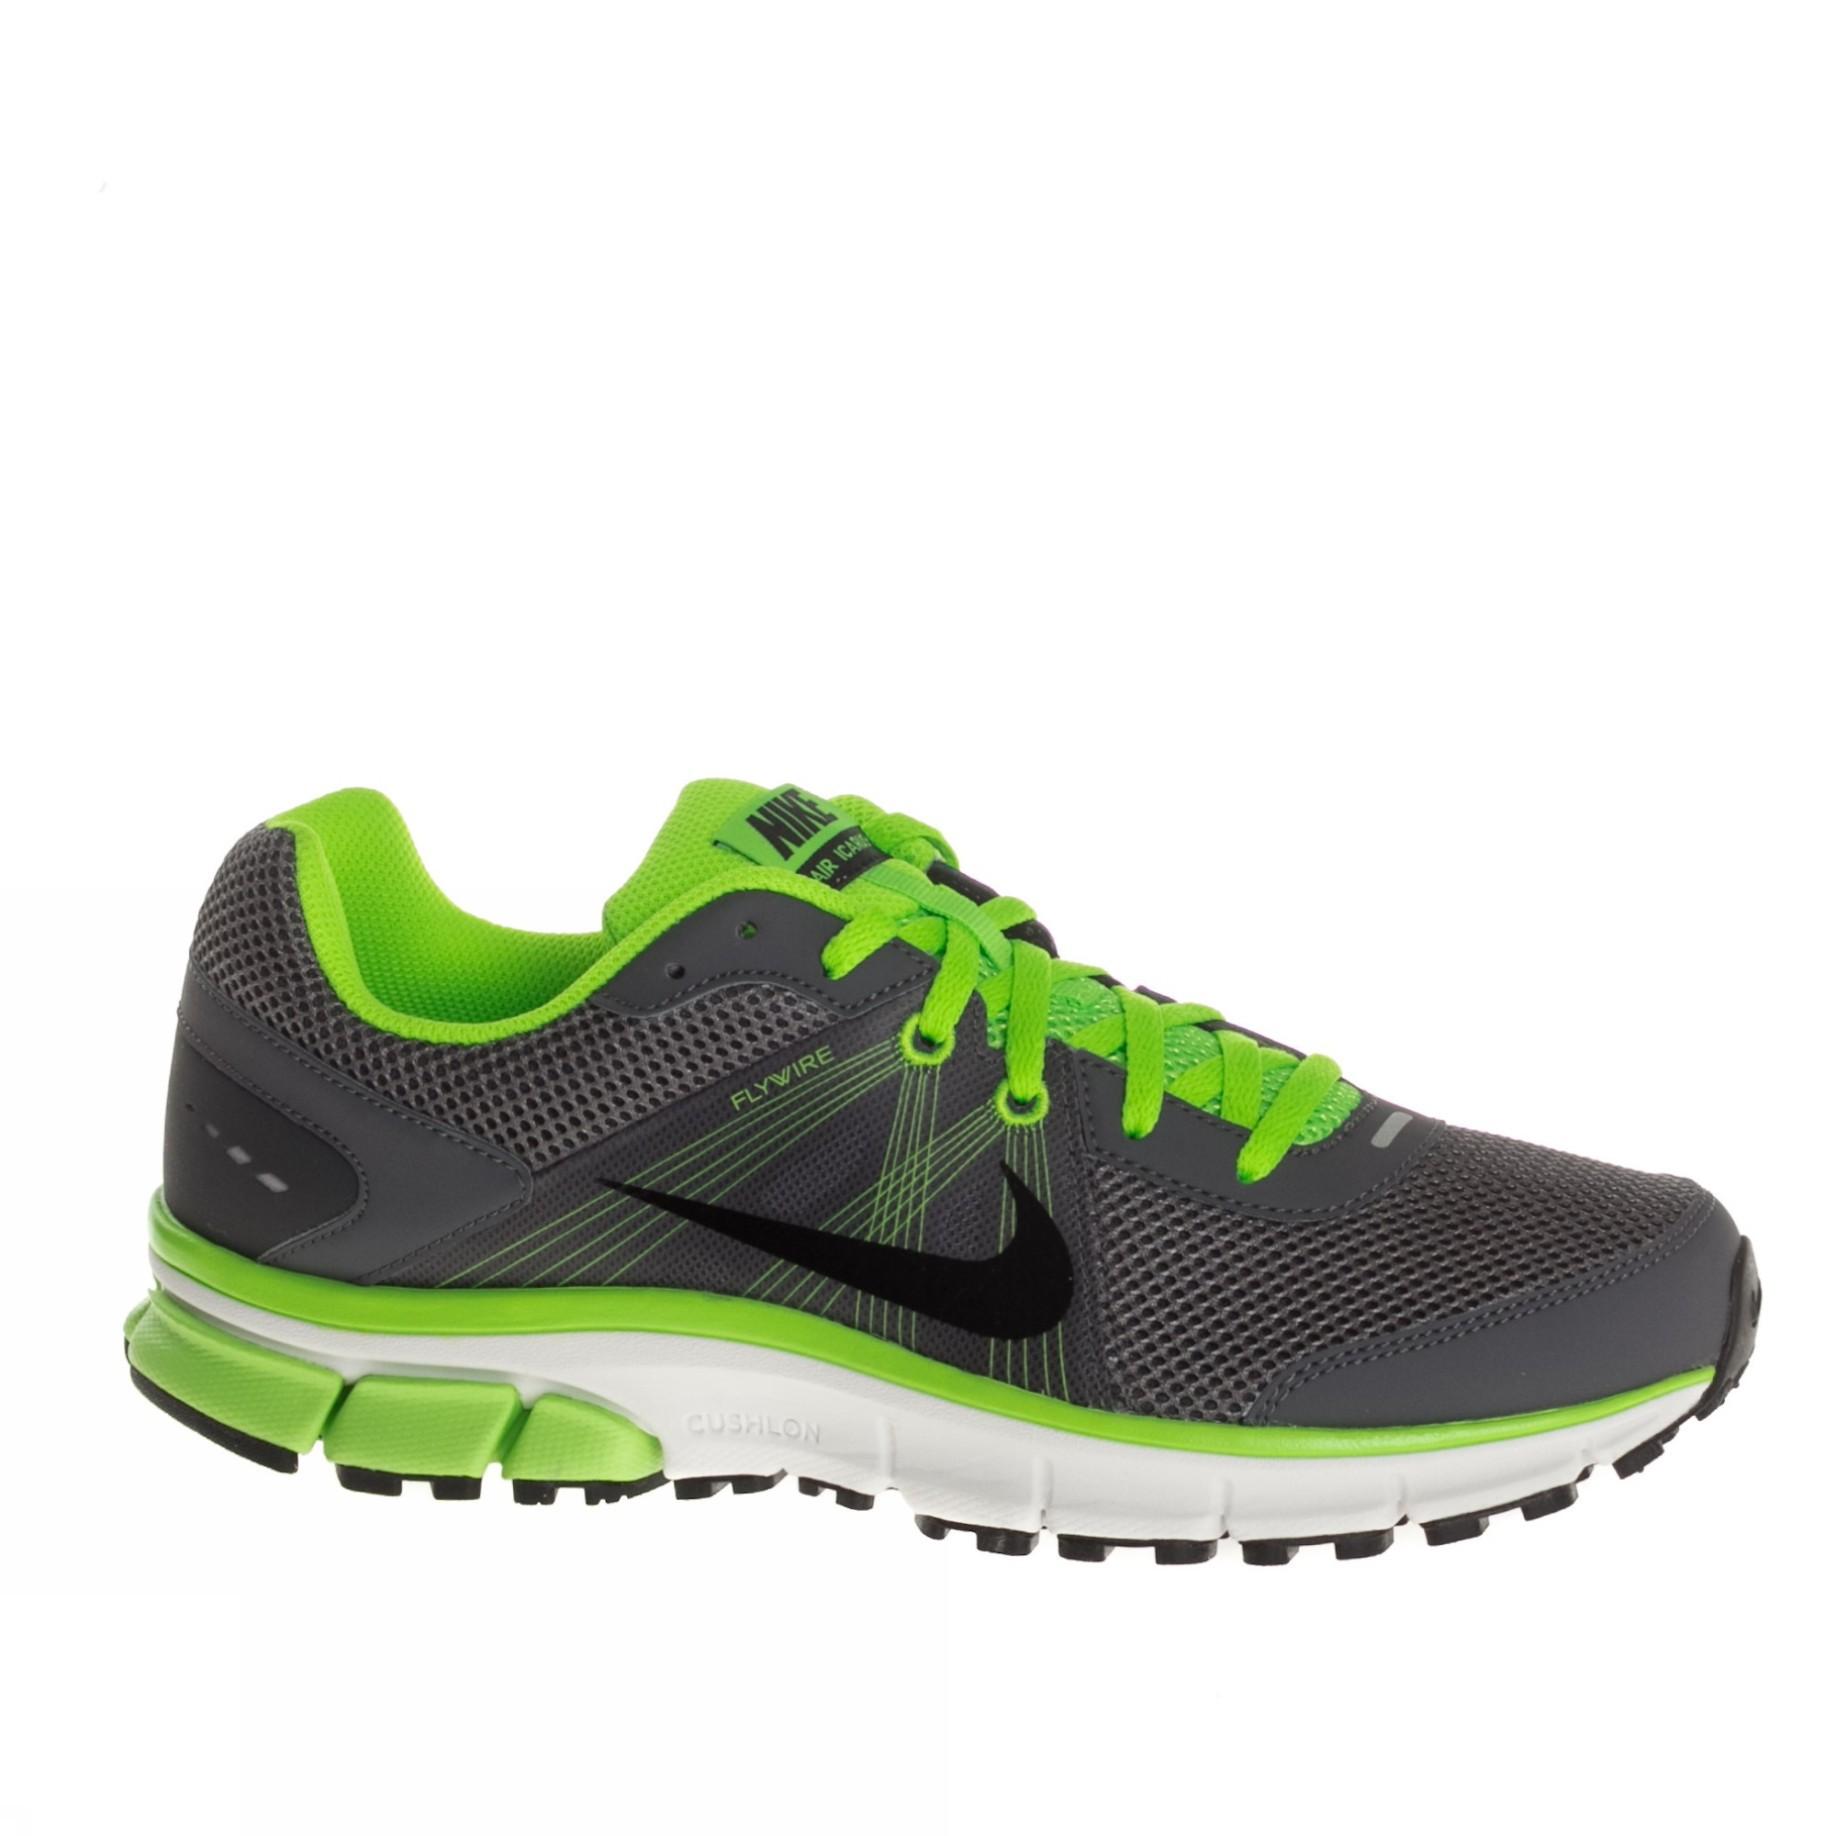 los angeles 927ab 3c85a scarpe running uomo air icarus